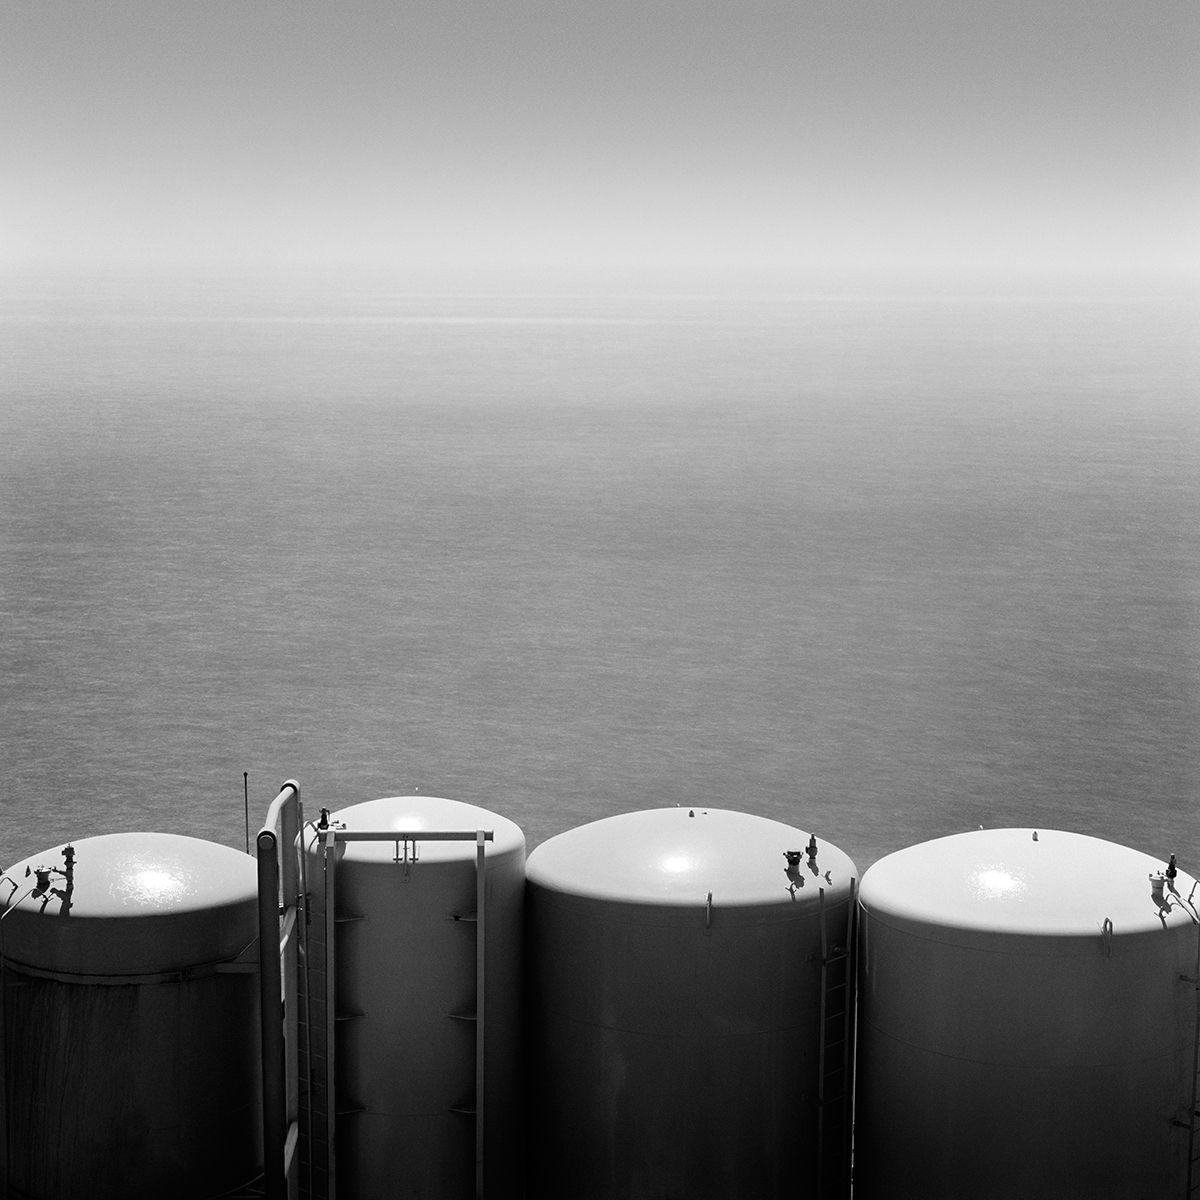 Offshore Storage Tanks copy.jpg